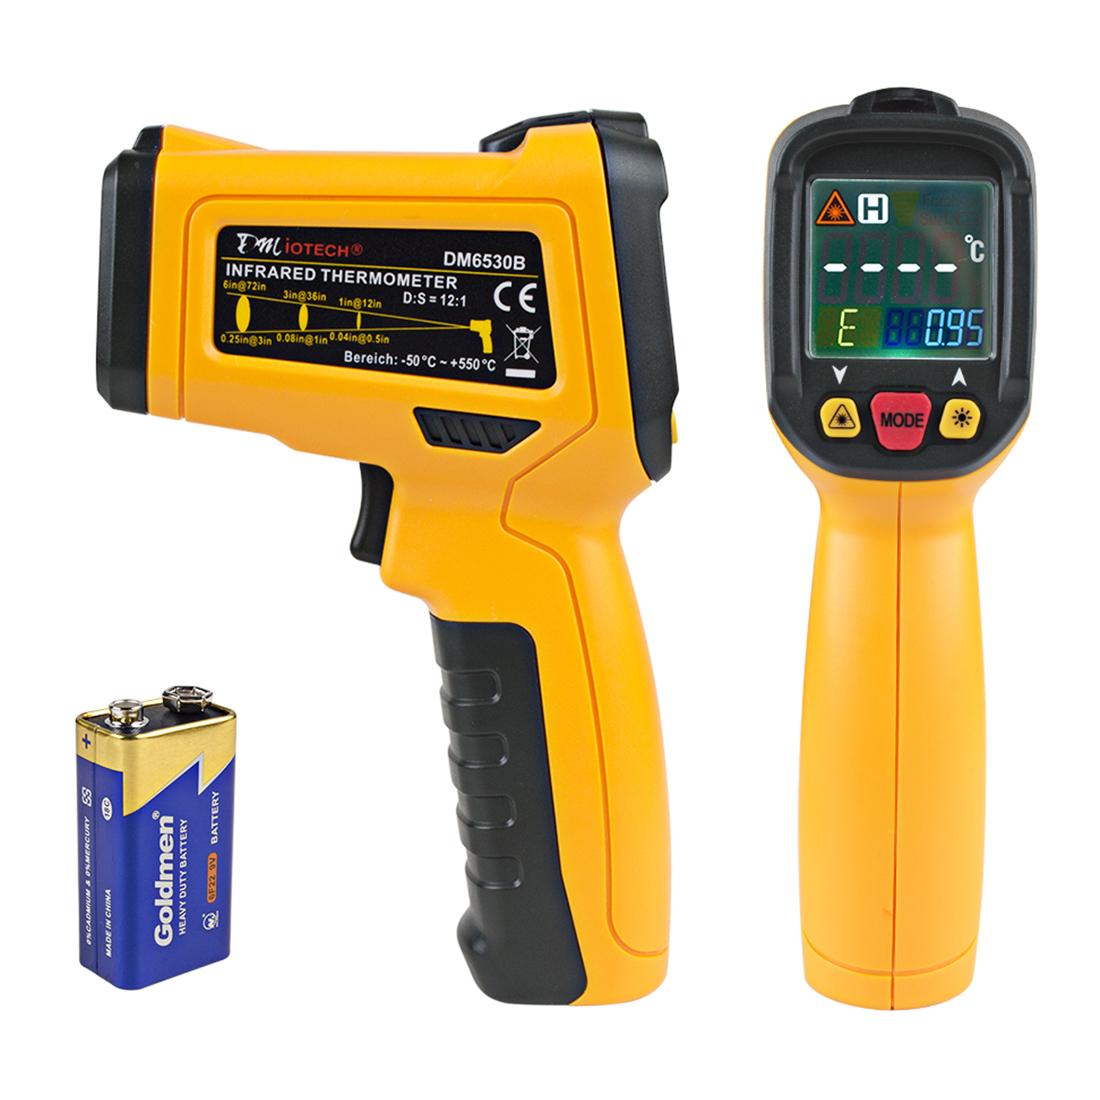 DM6530B Non-contact Digital Laser Infrared Thermometer Gun Temp Handheld Orange Black